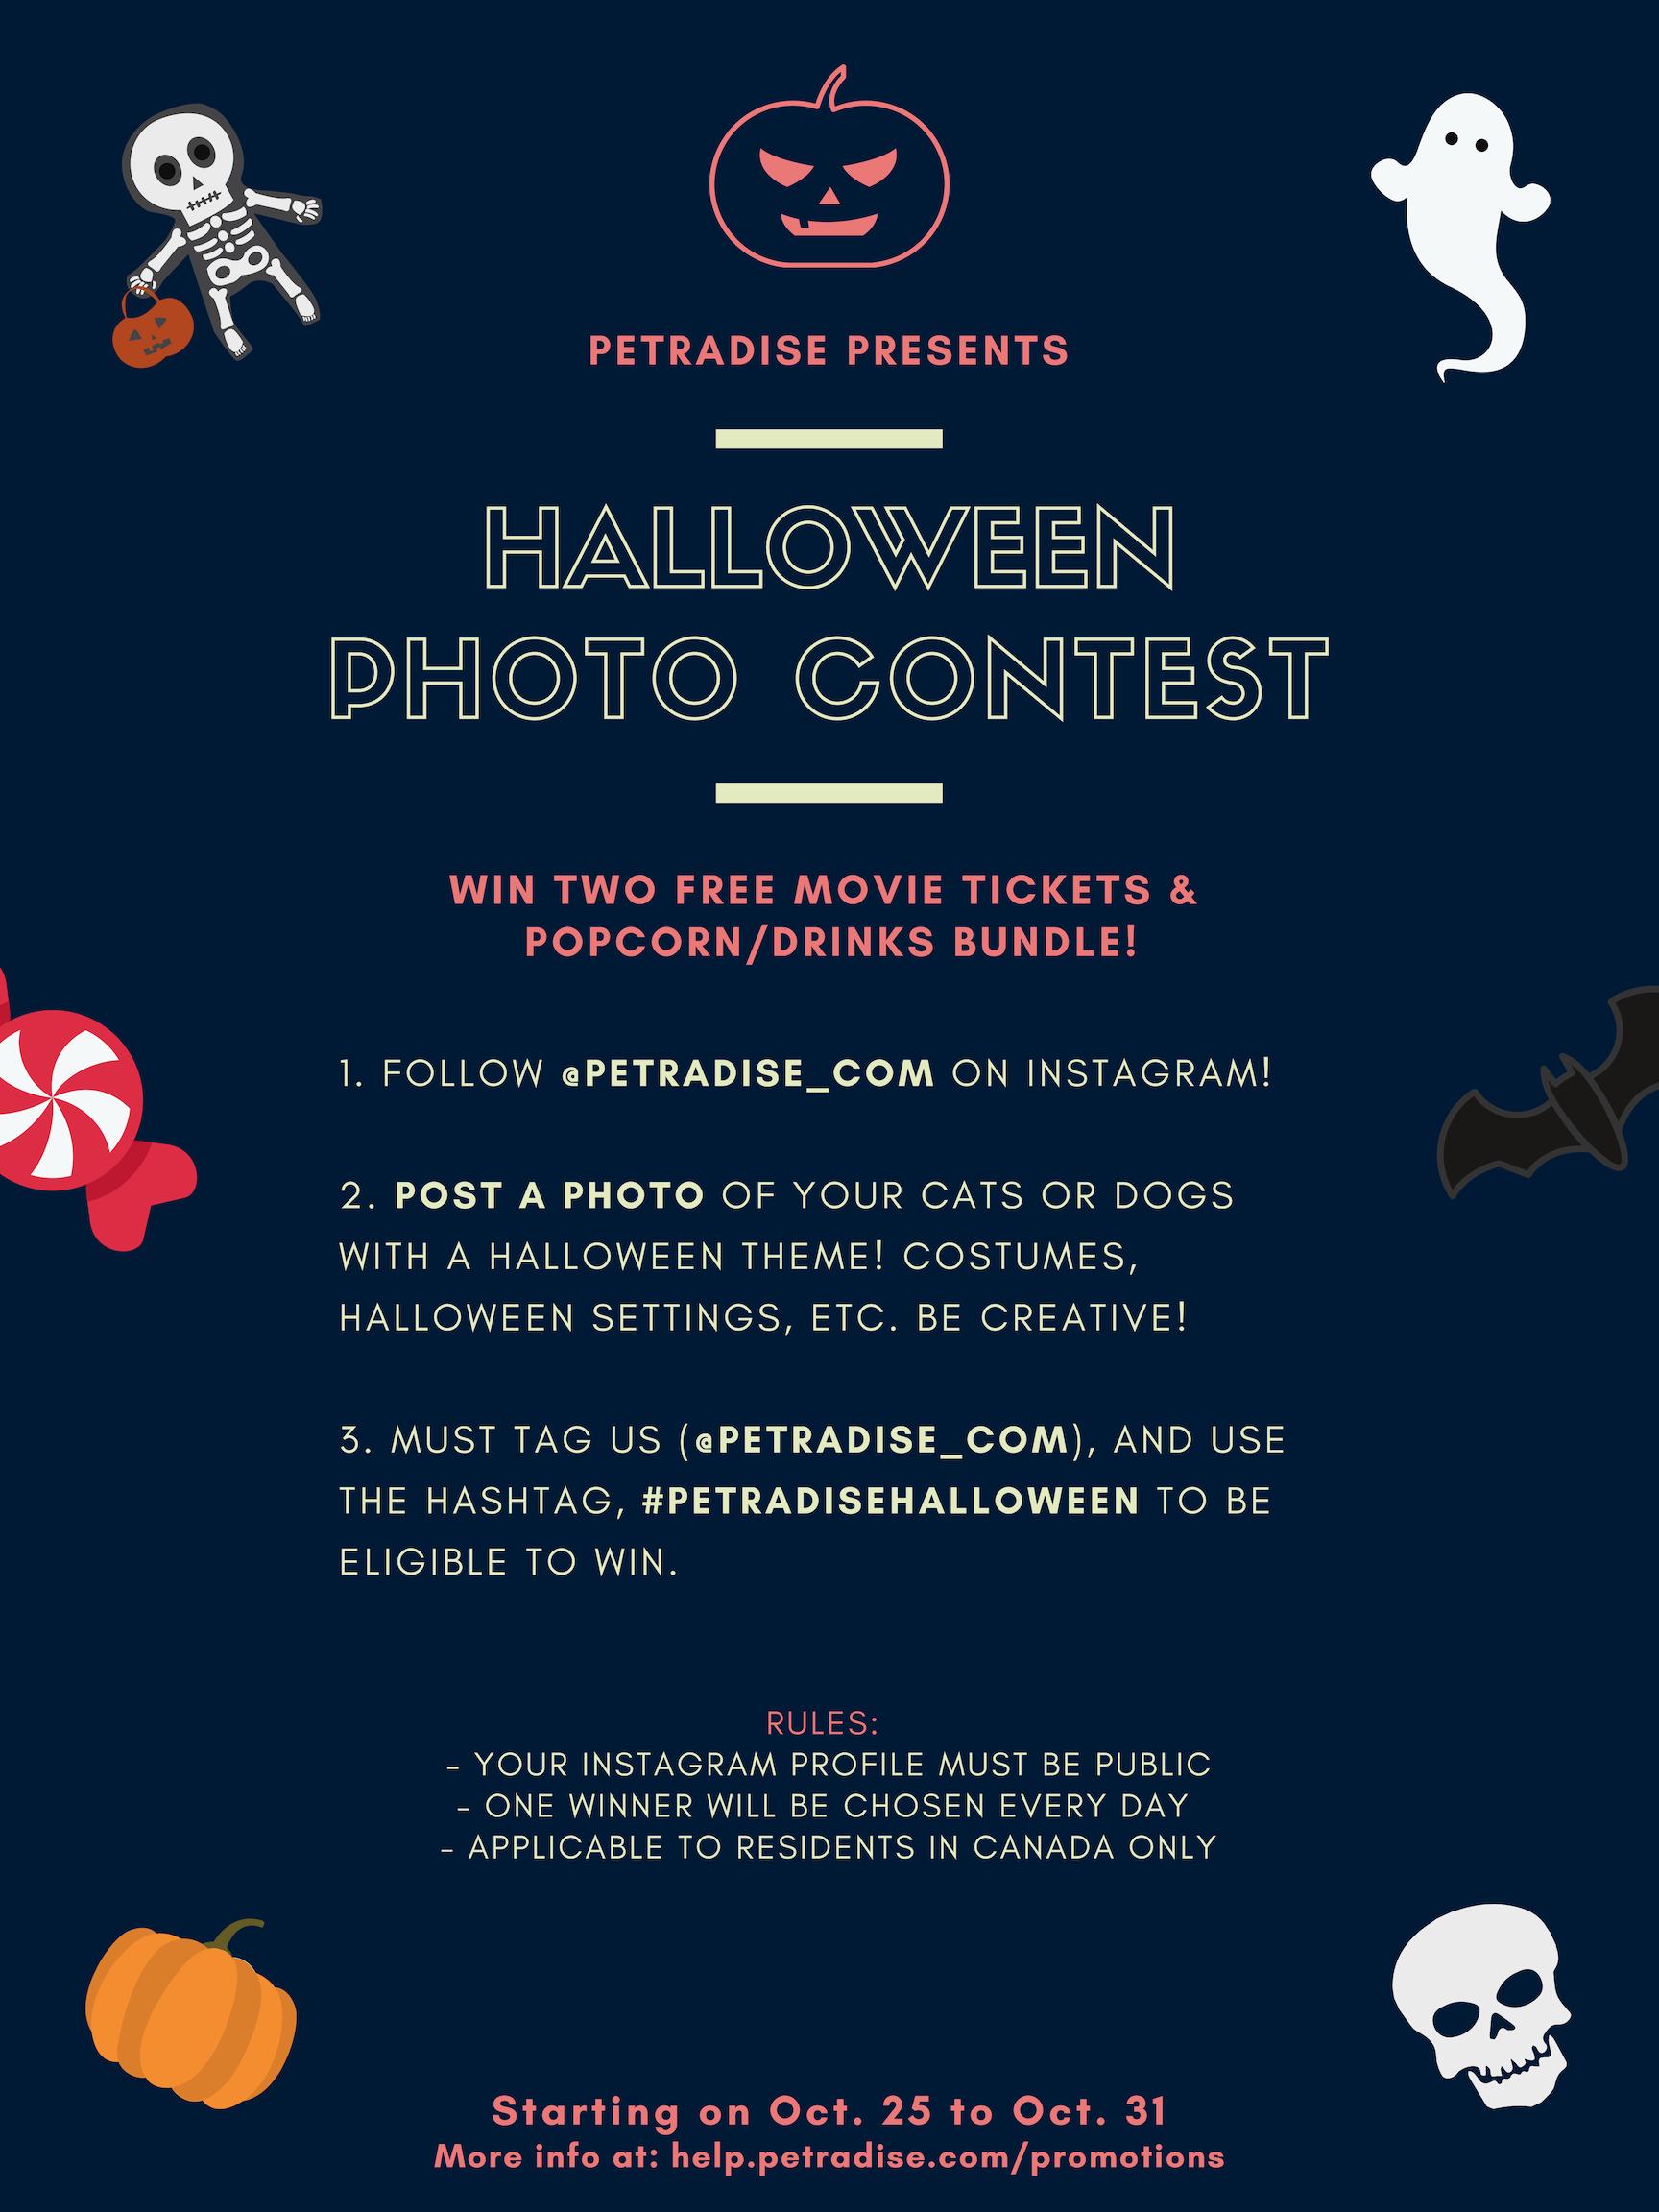 petradise's halloween photo contest | petradise help center